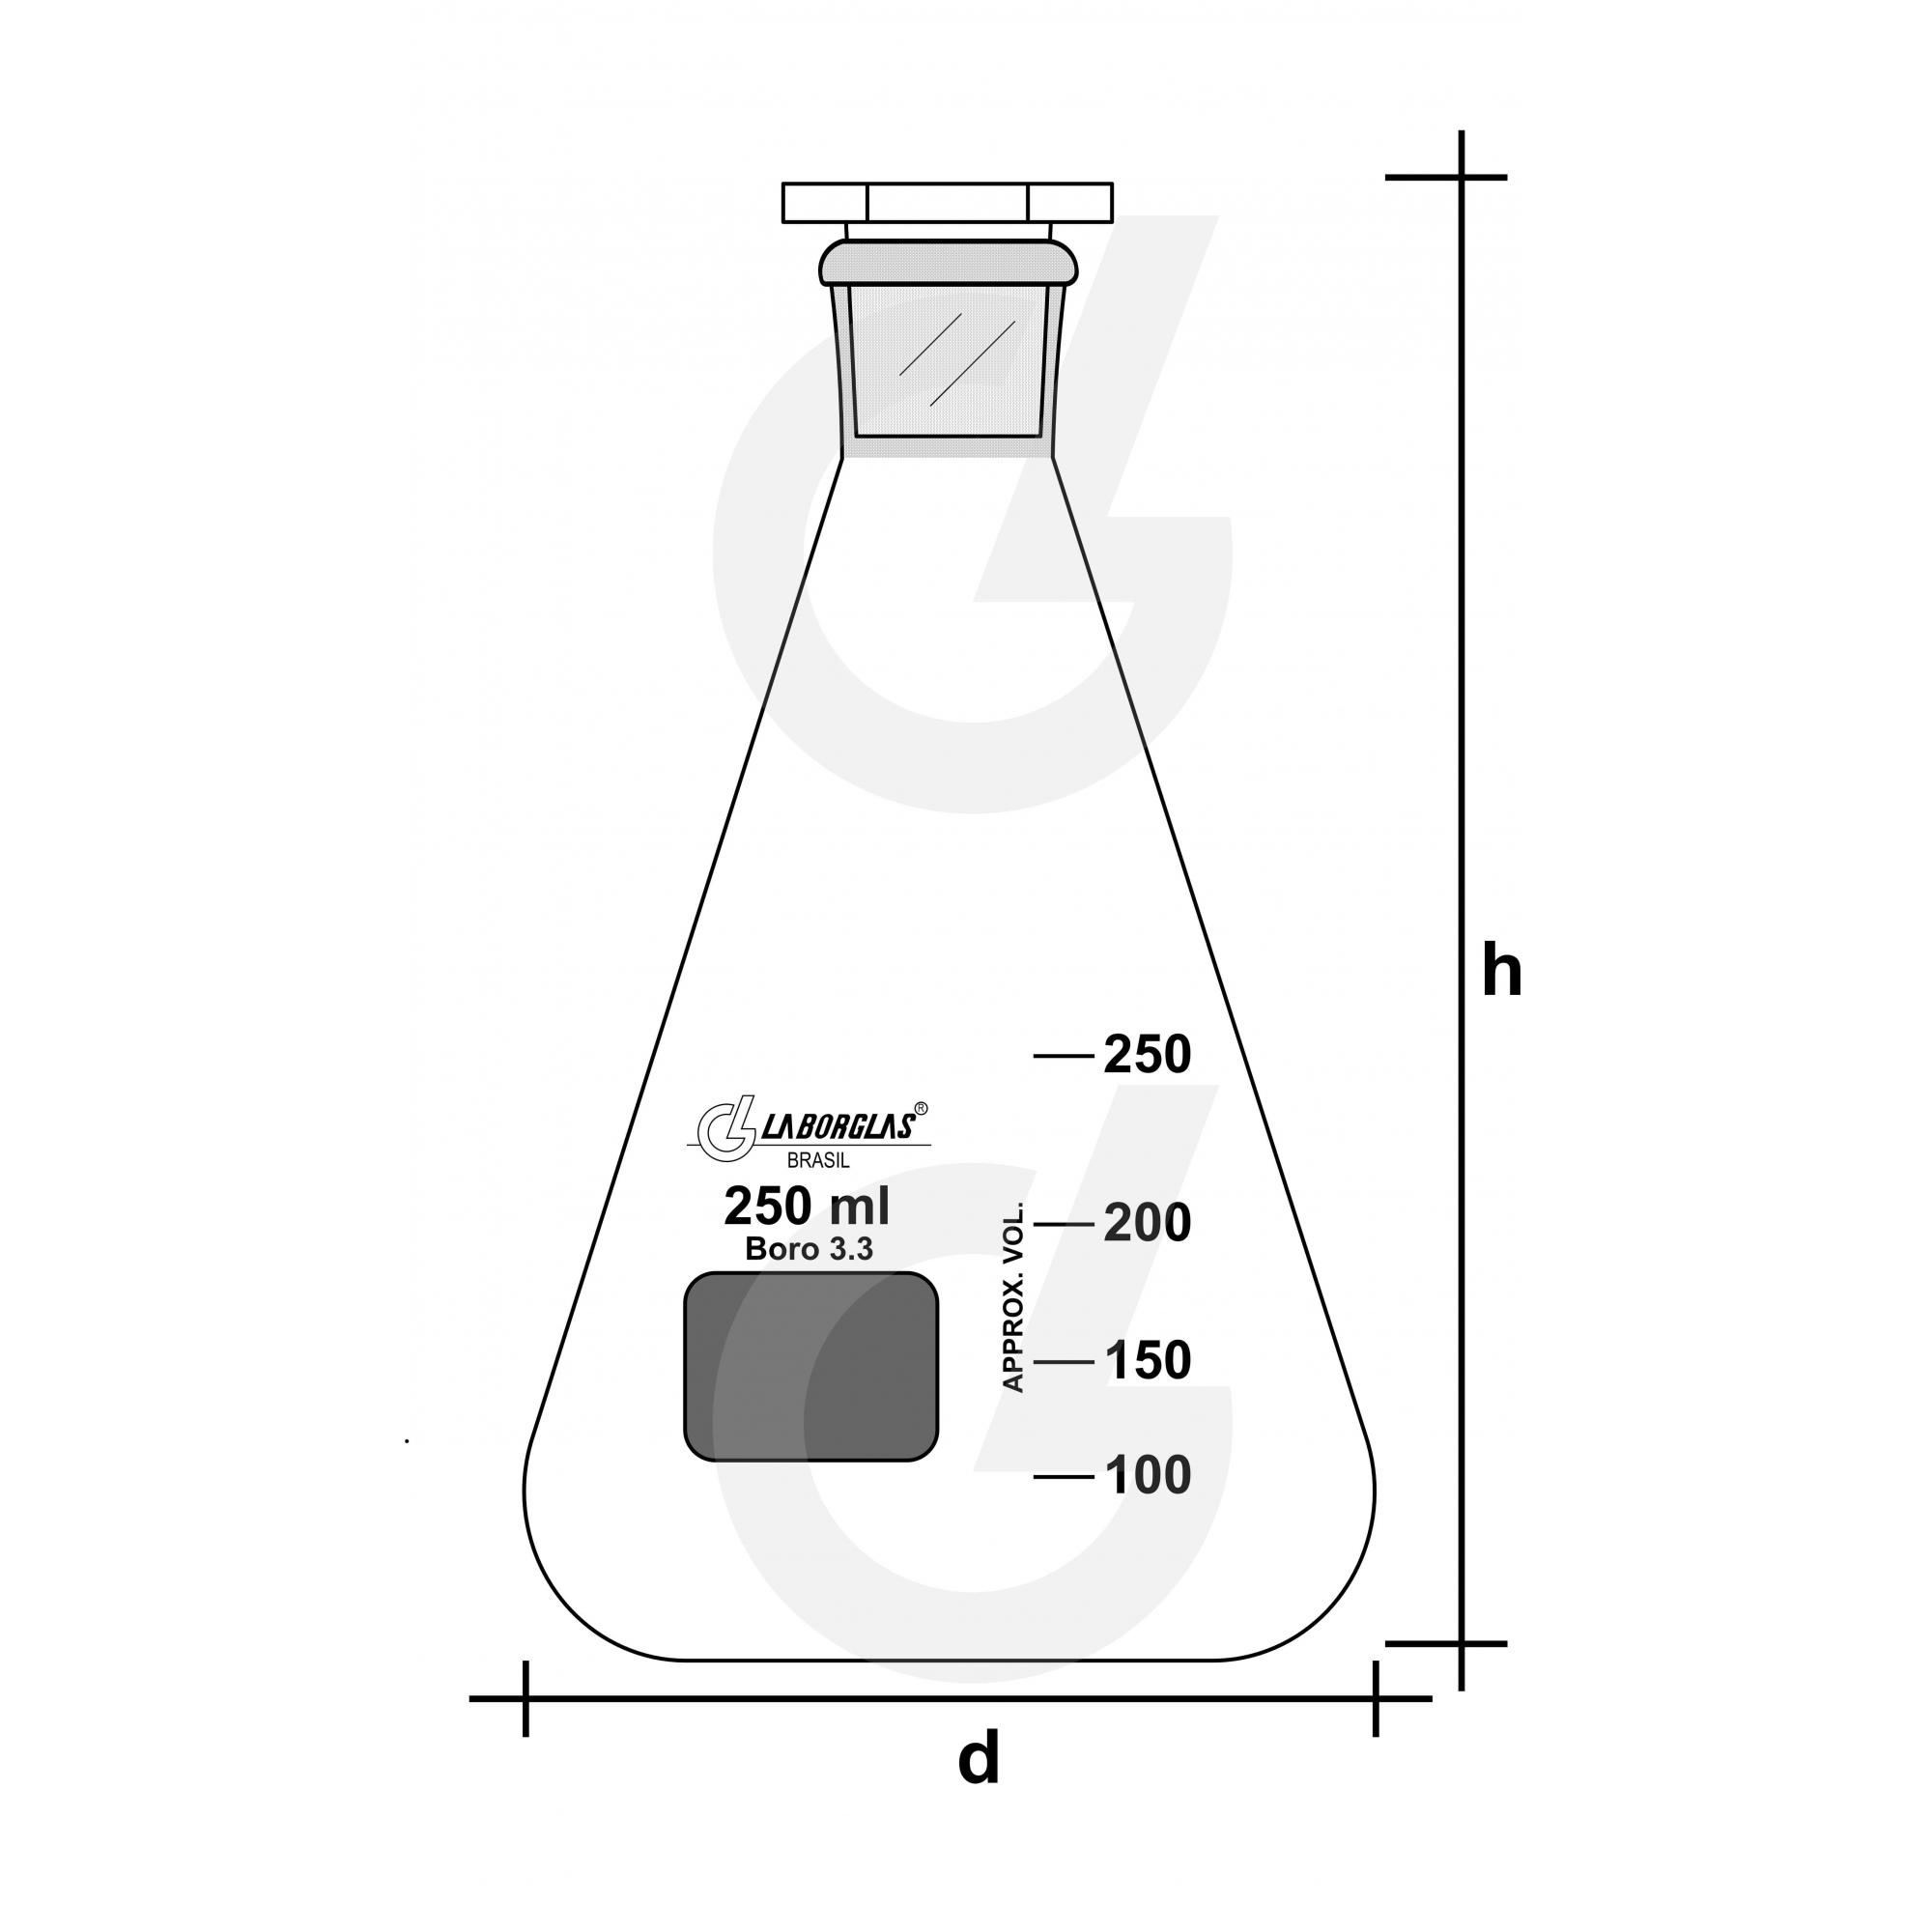 FRASCO ERLENMEYER C/ ROLHA VIDRO 1000 ML - Laborglas - Cód. 91216543